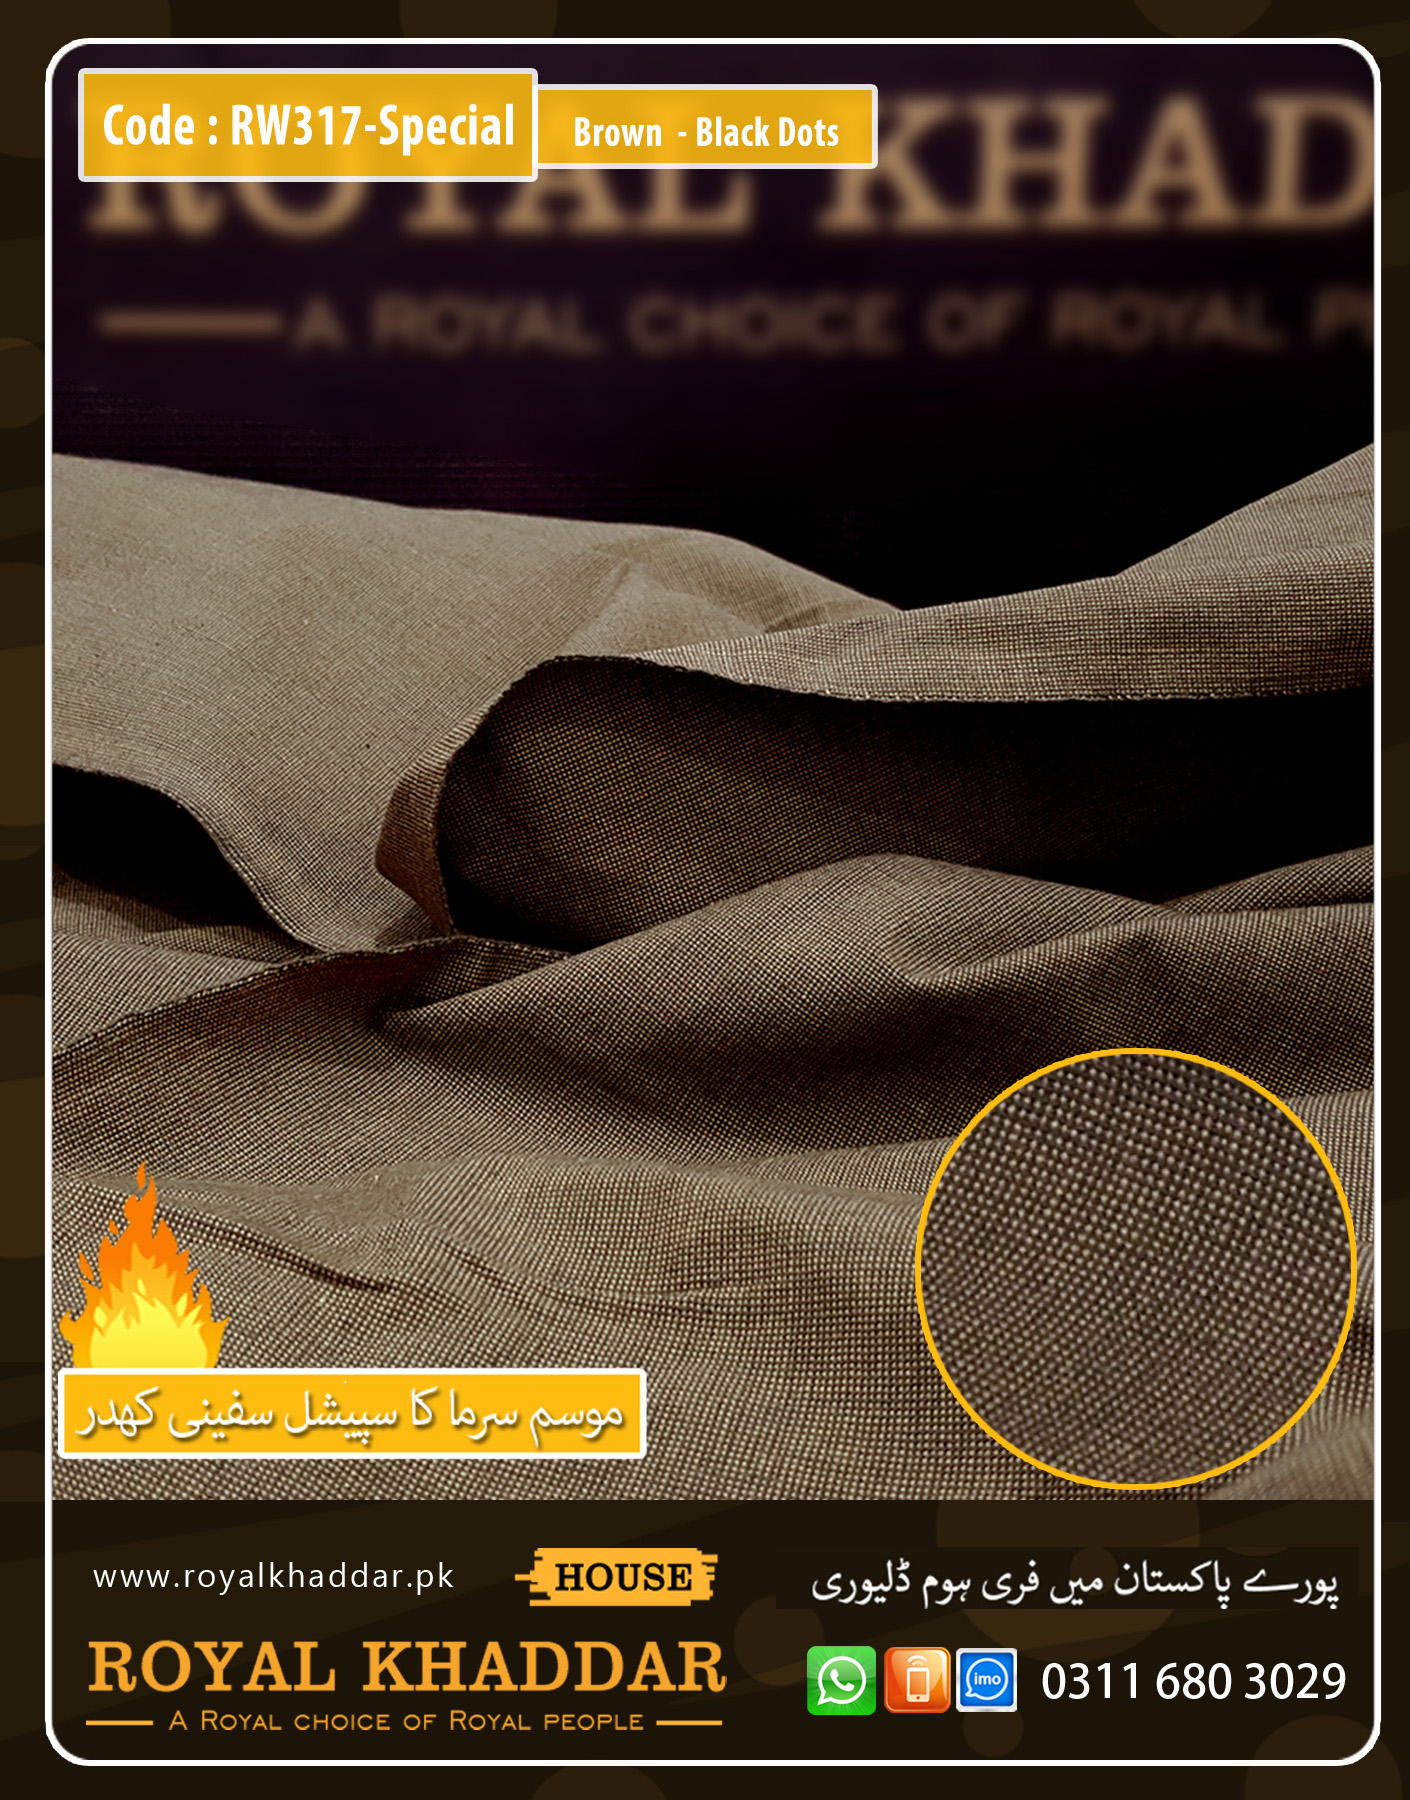 RW317 Brown - Black Dots Special Safini Khaddar